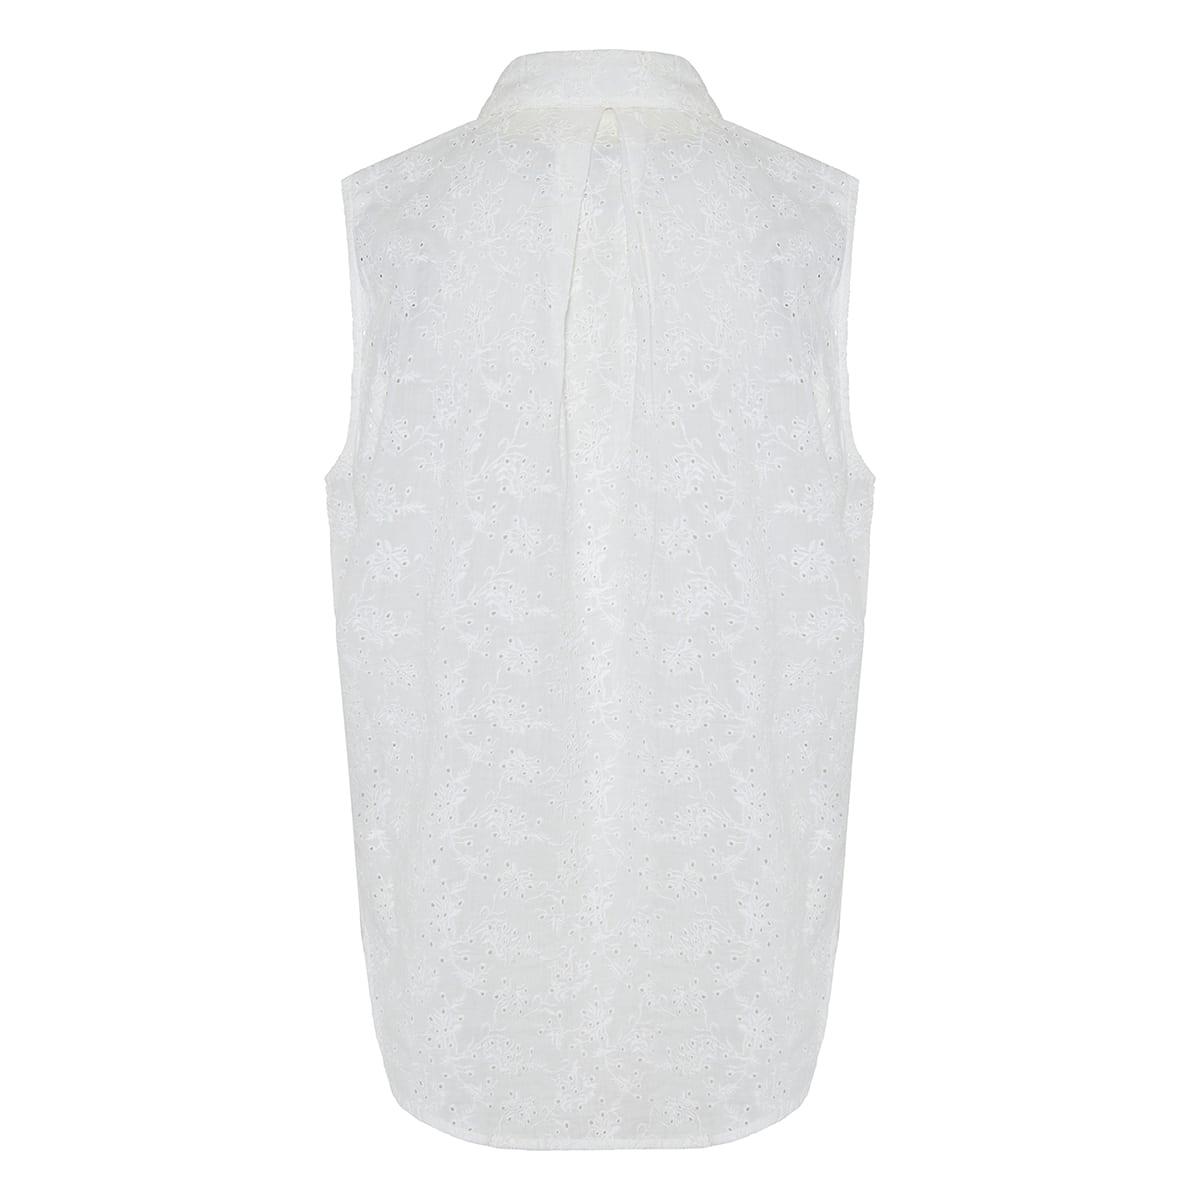 April broderie anglaise sleeveless shirt